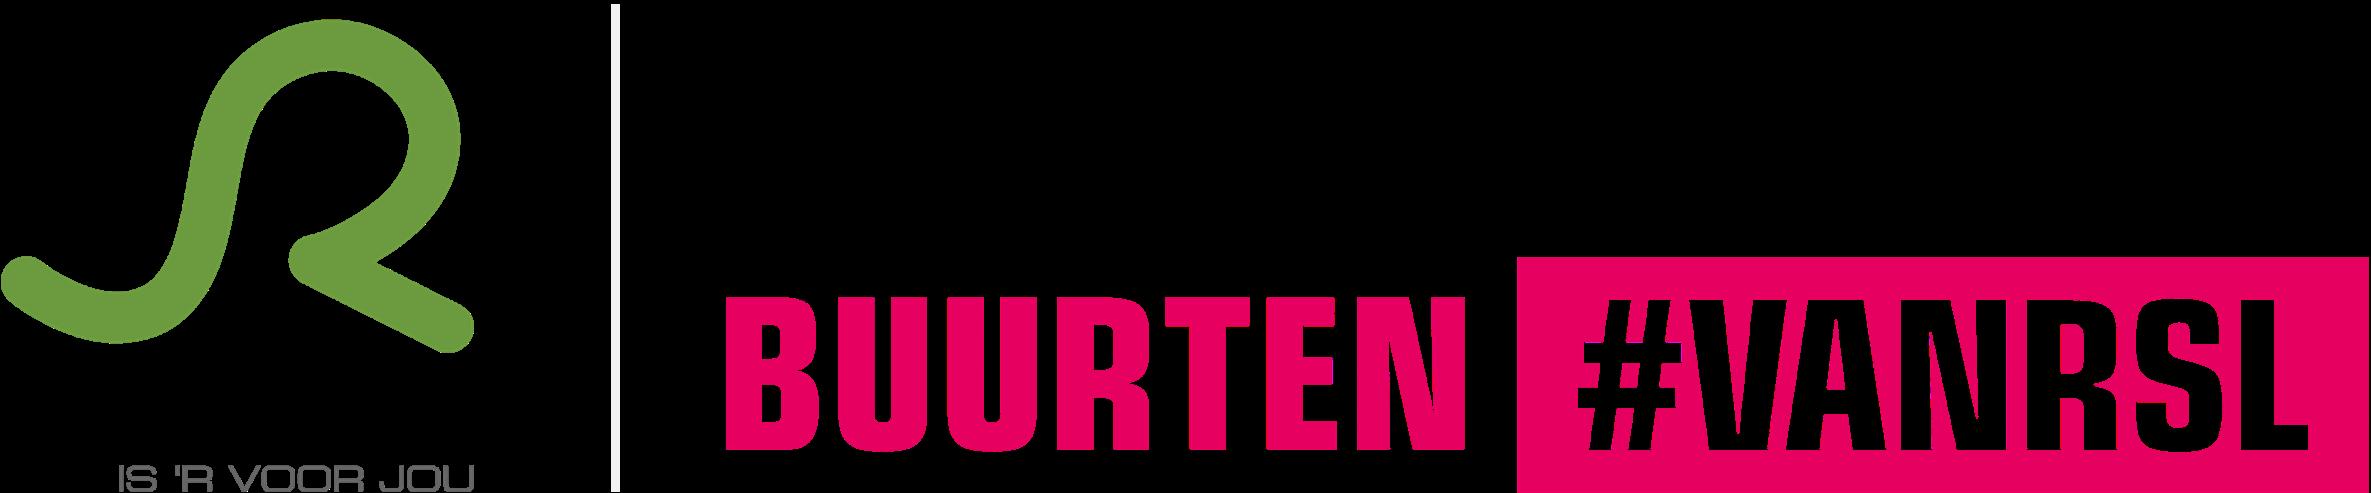 Logo Buurten #VANRSL